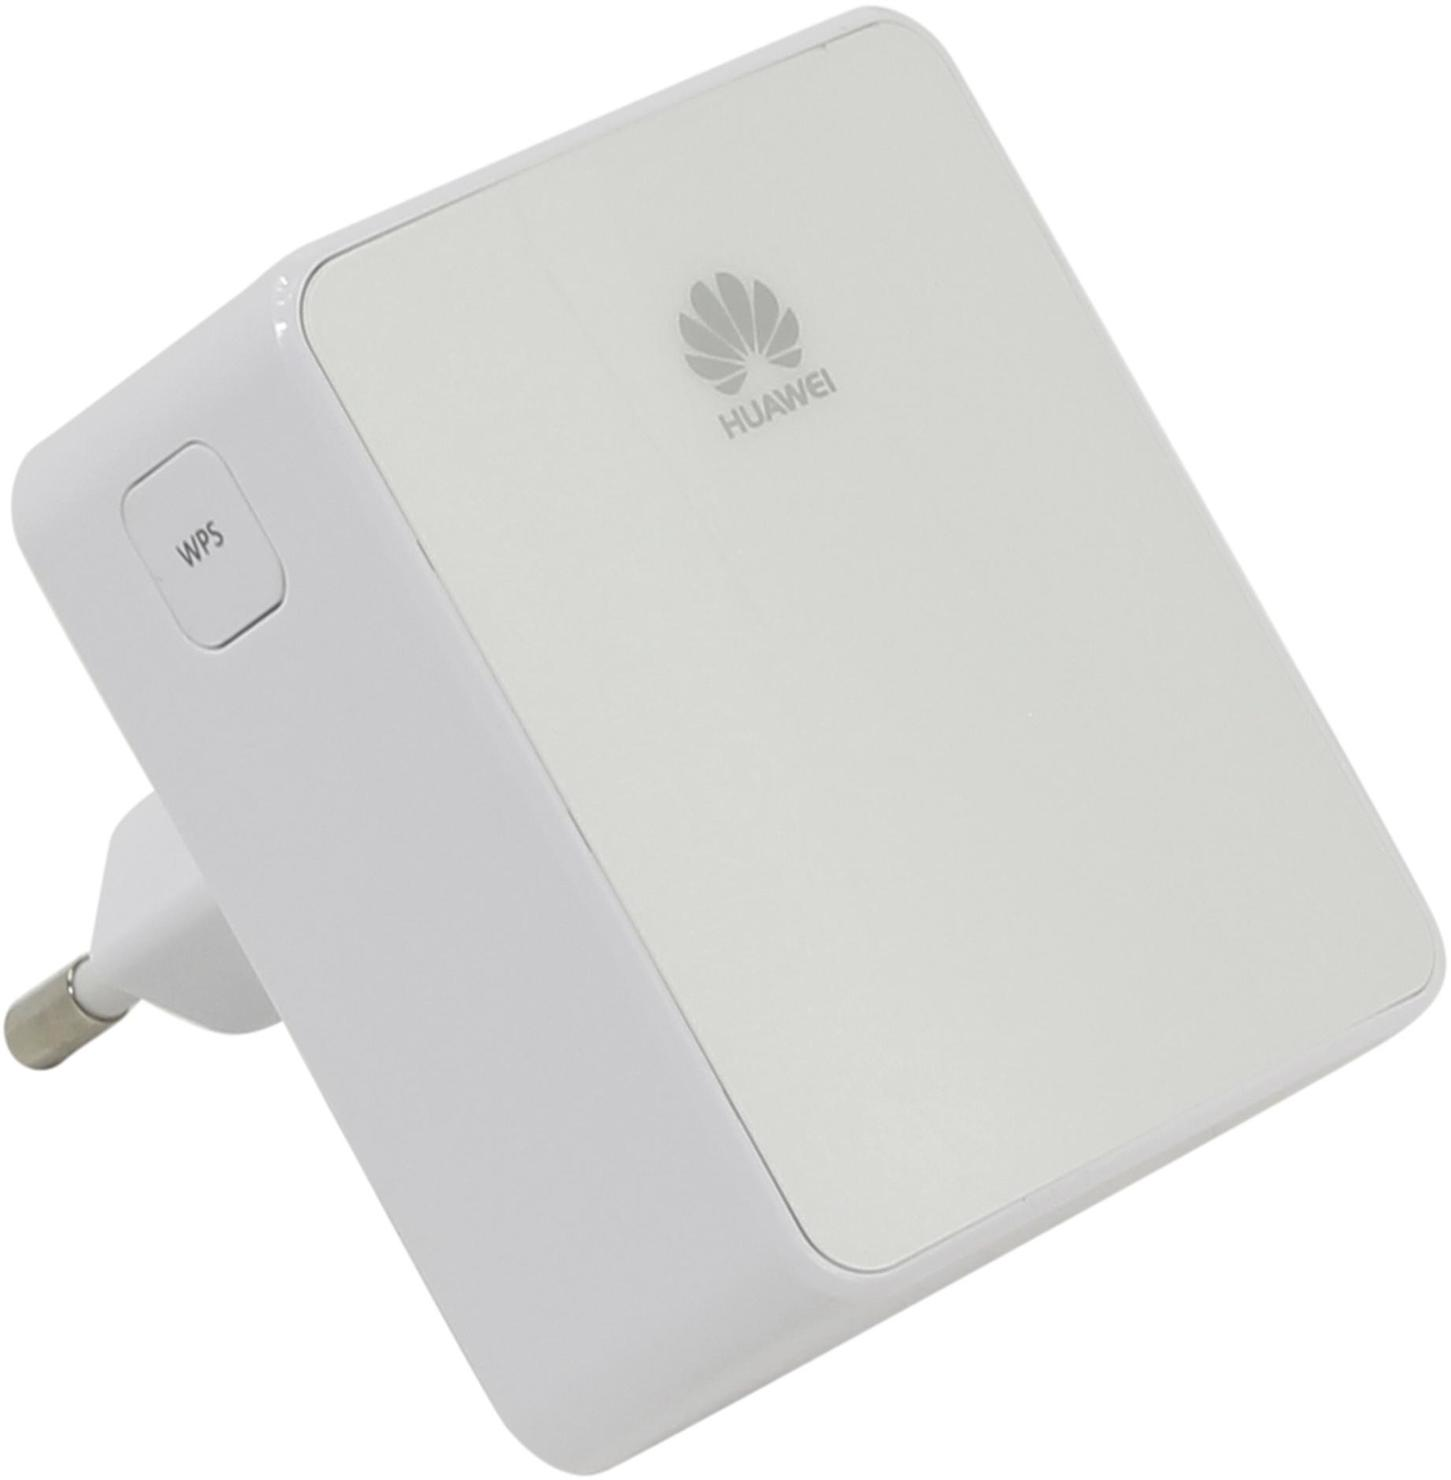 Huawei Ws331c Wireless Range Extender